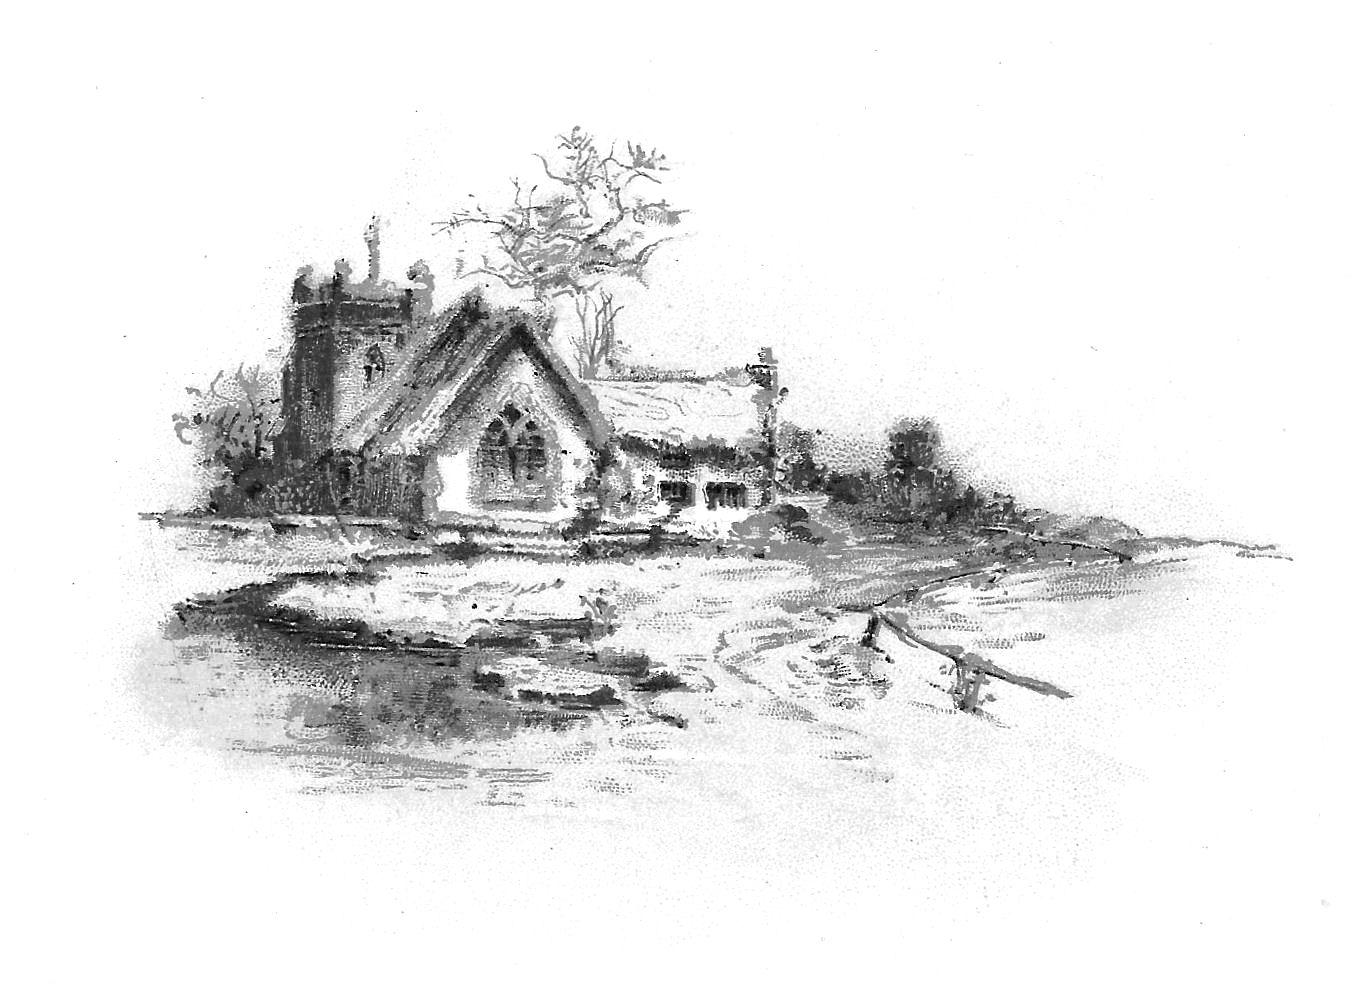 Antique Images Free Church Clip Art Rustic Church